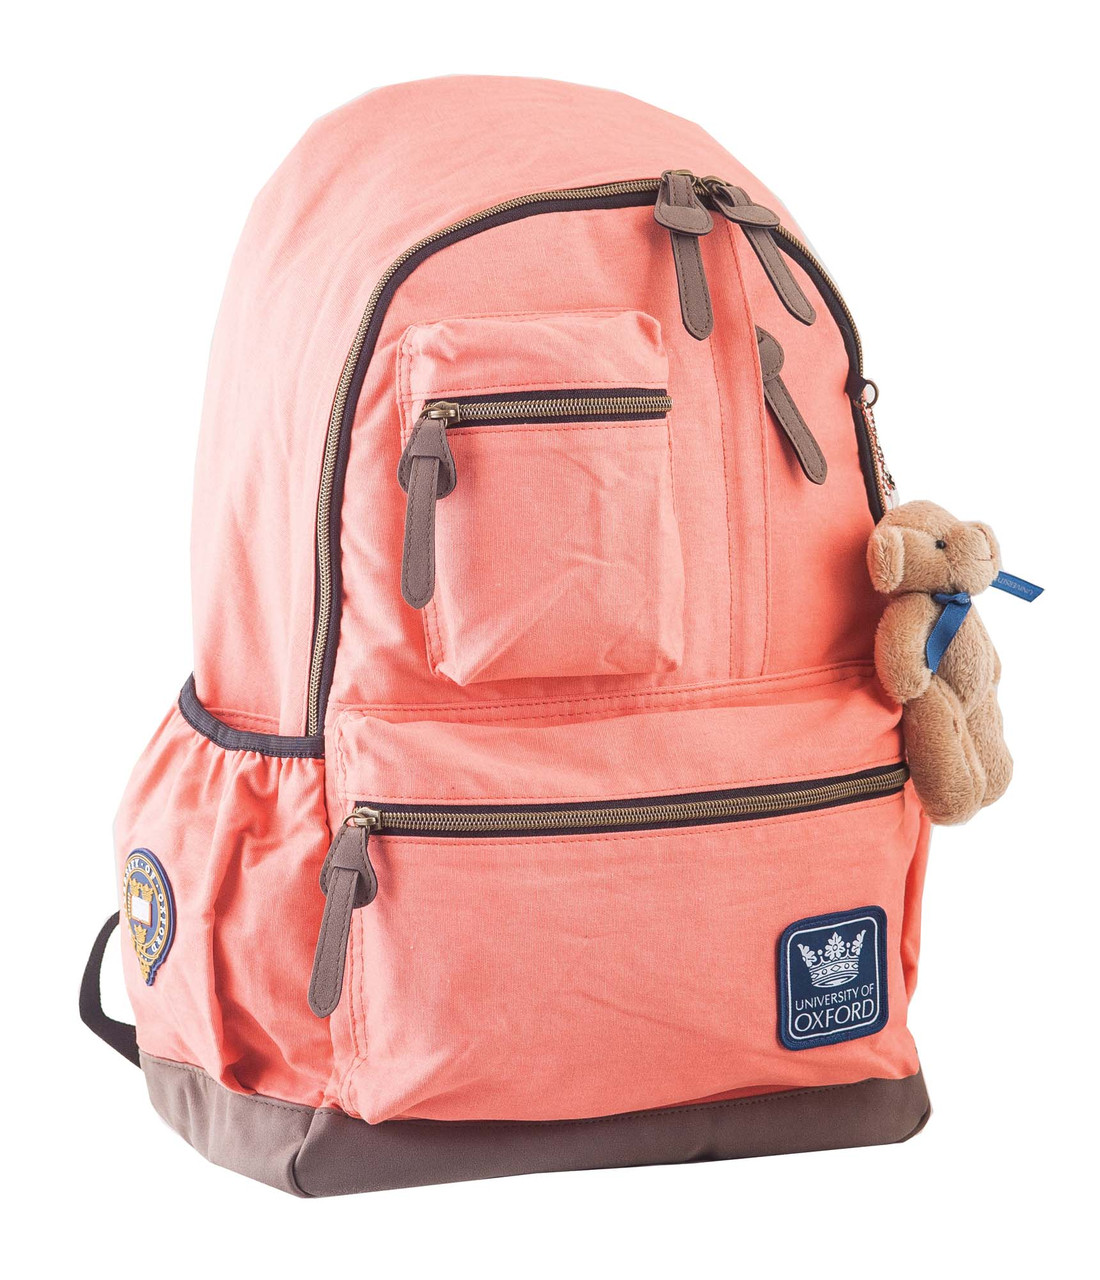 oxsford рюкзак